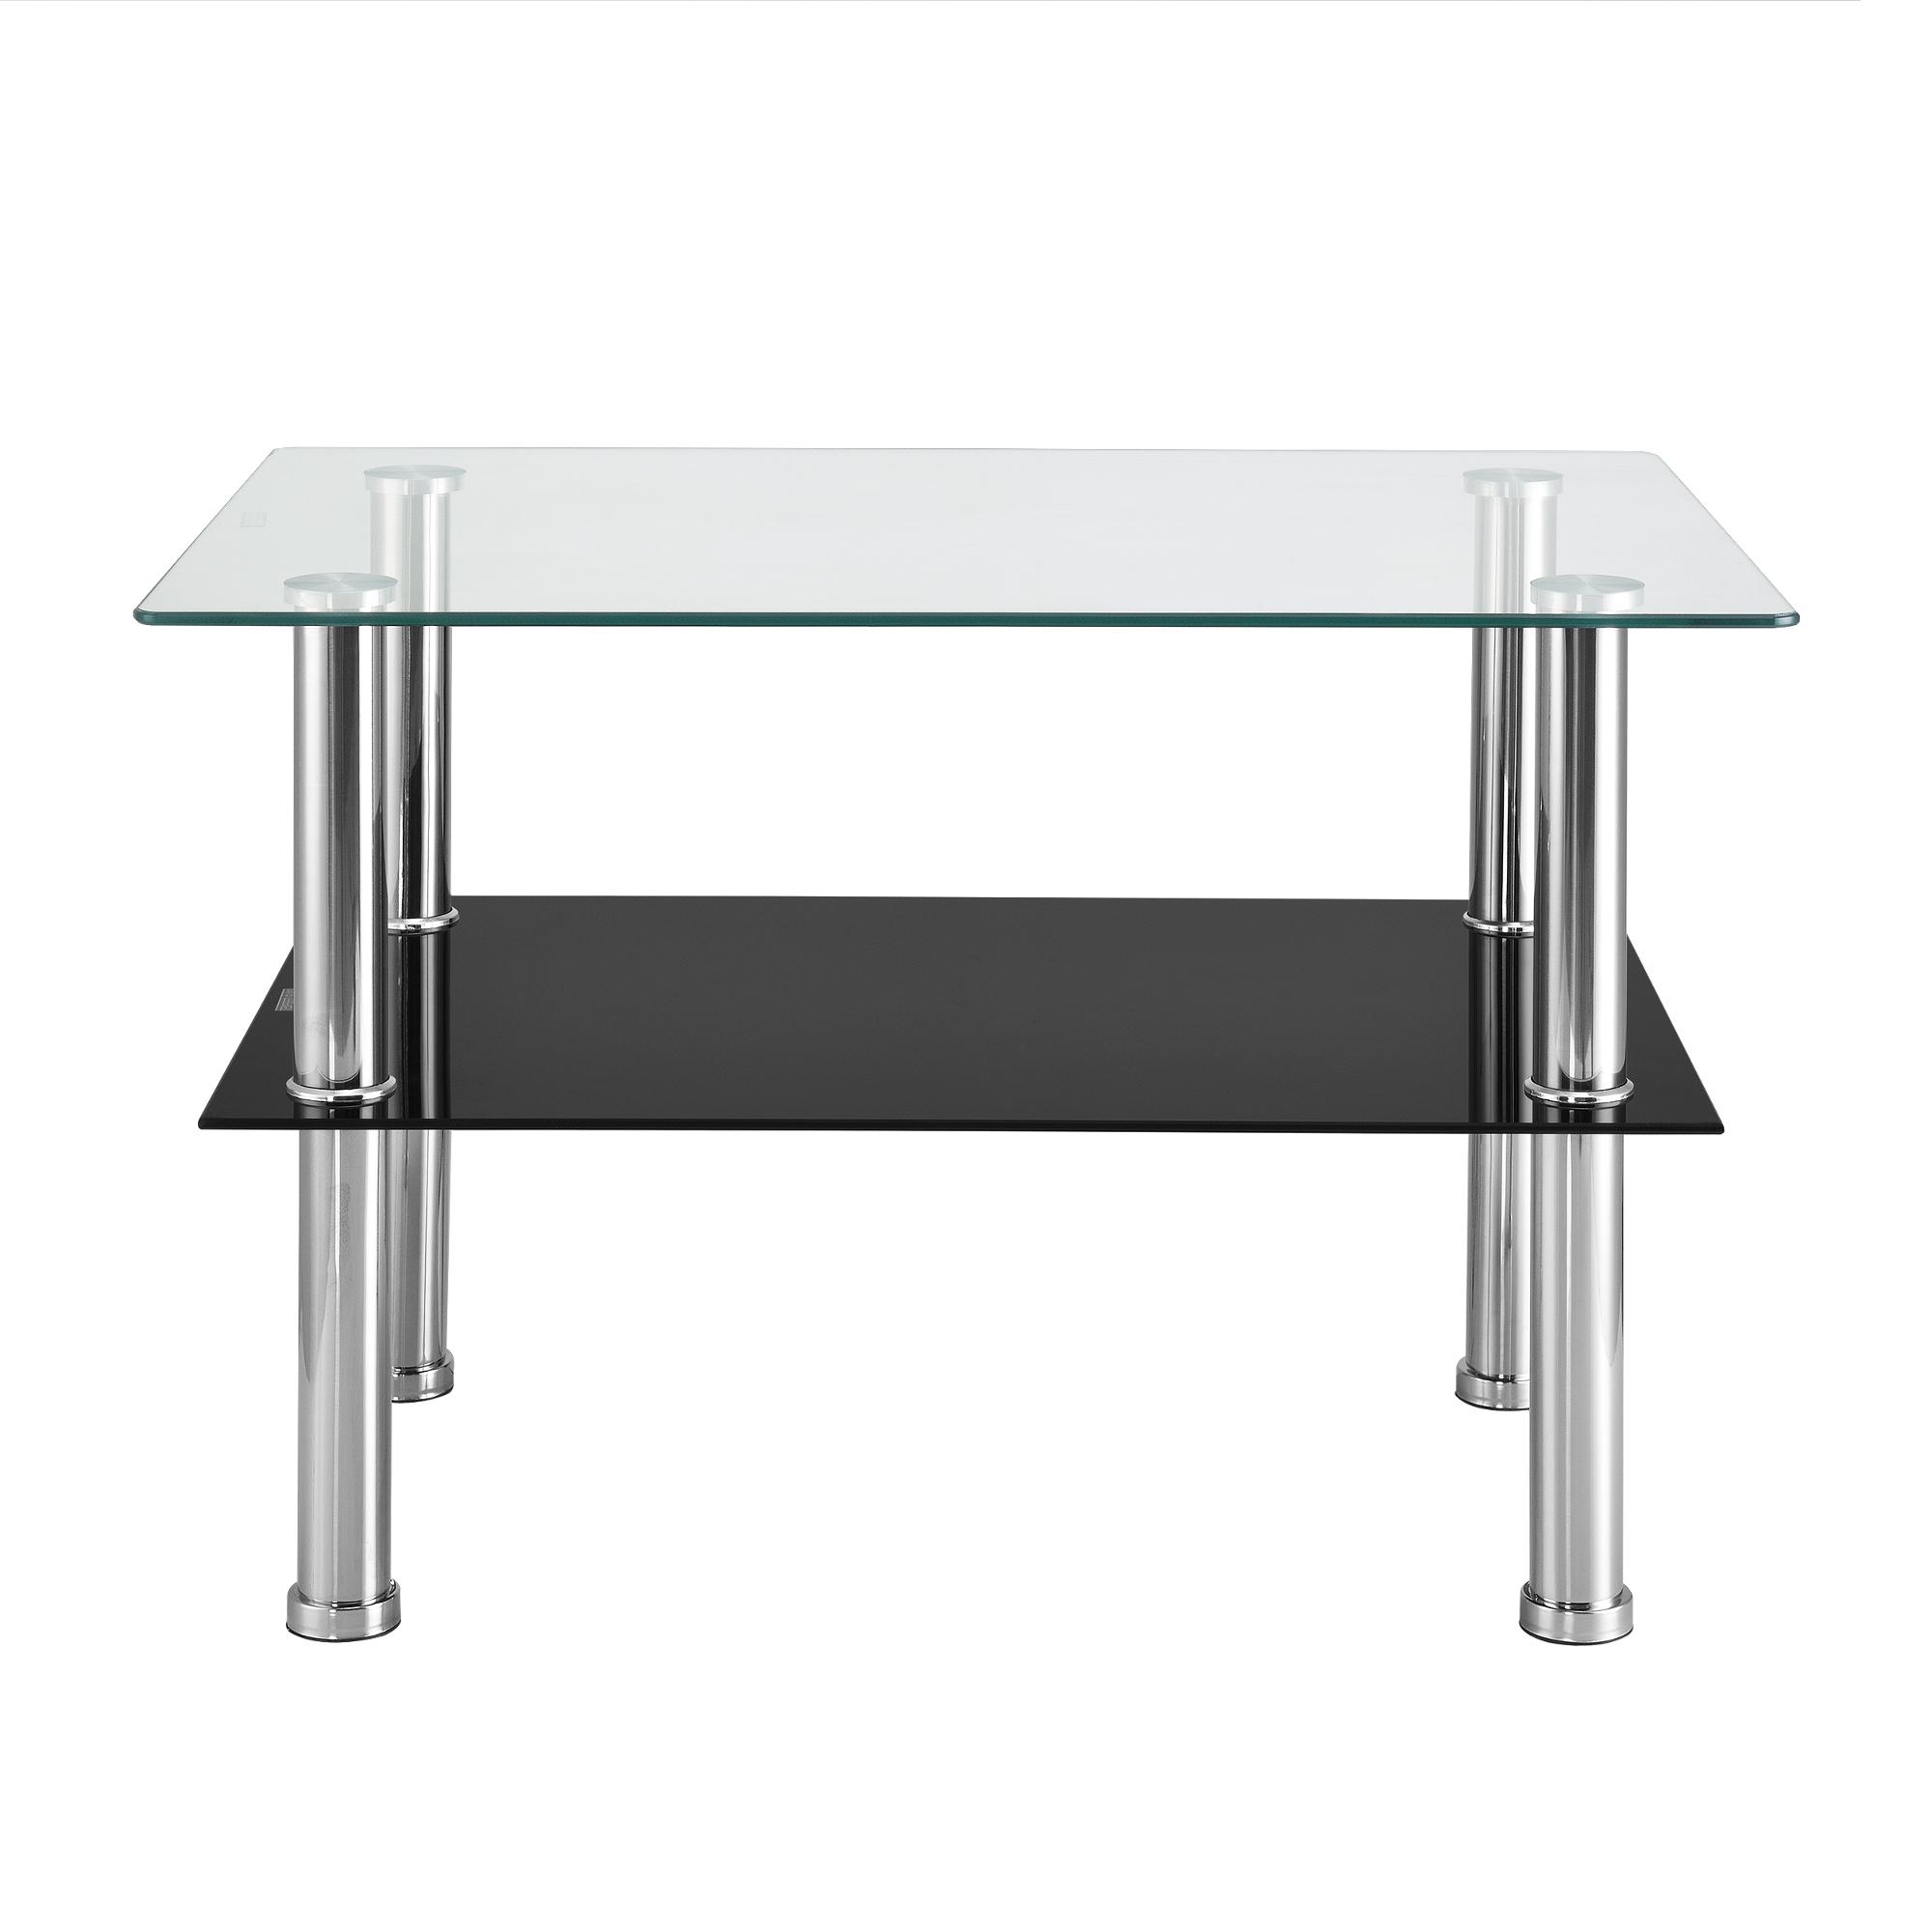 en.casa® Table Basse Table Gigogne Table de Salon en Verre de ...